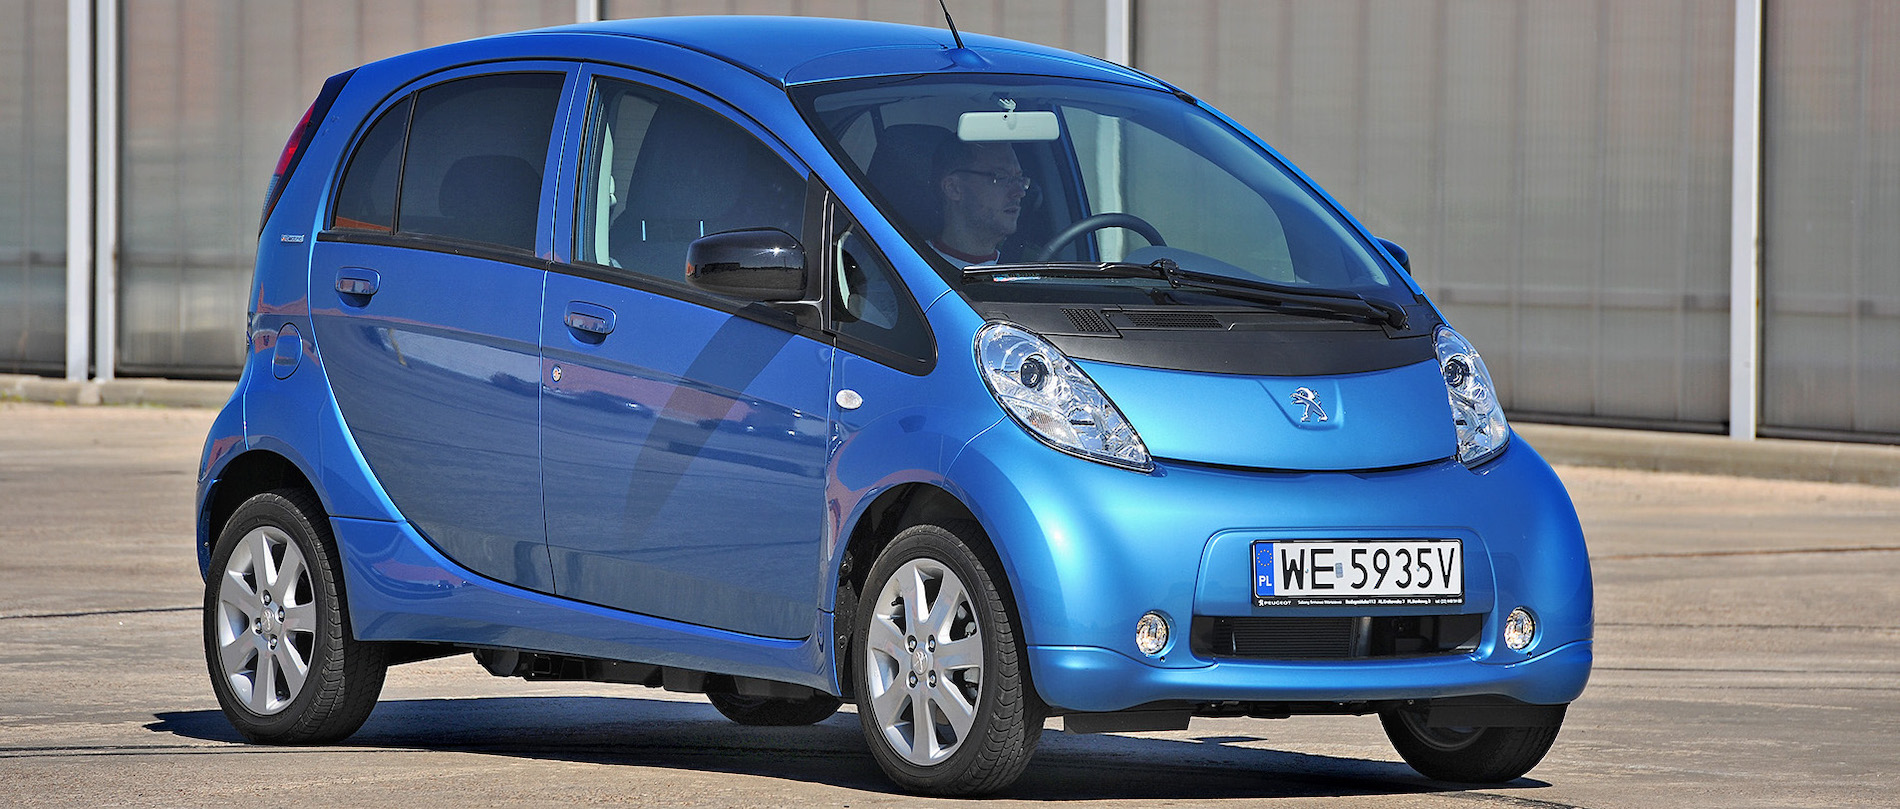 Peugeot iOn (2010-2020)